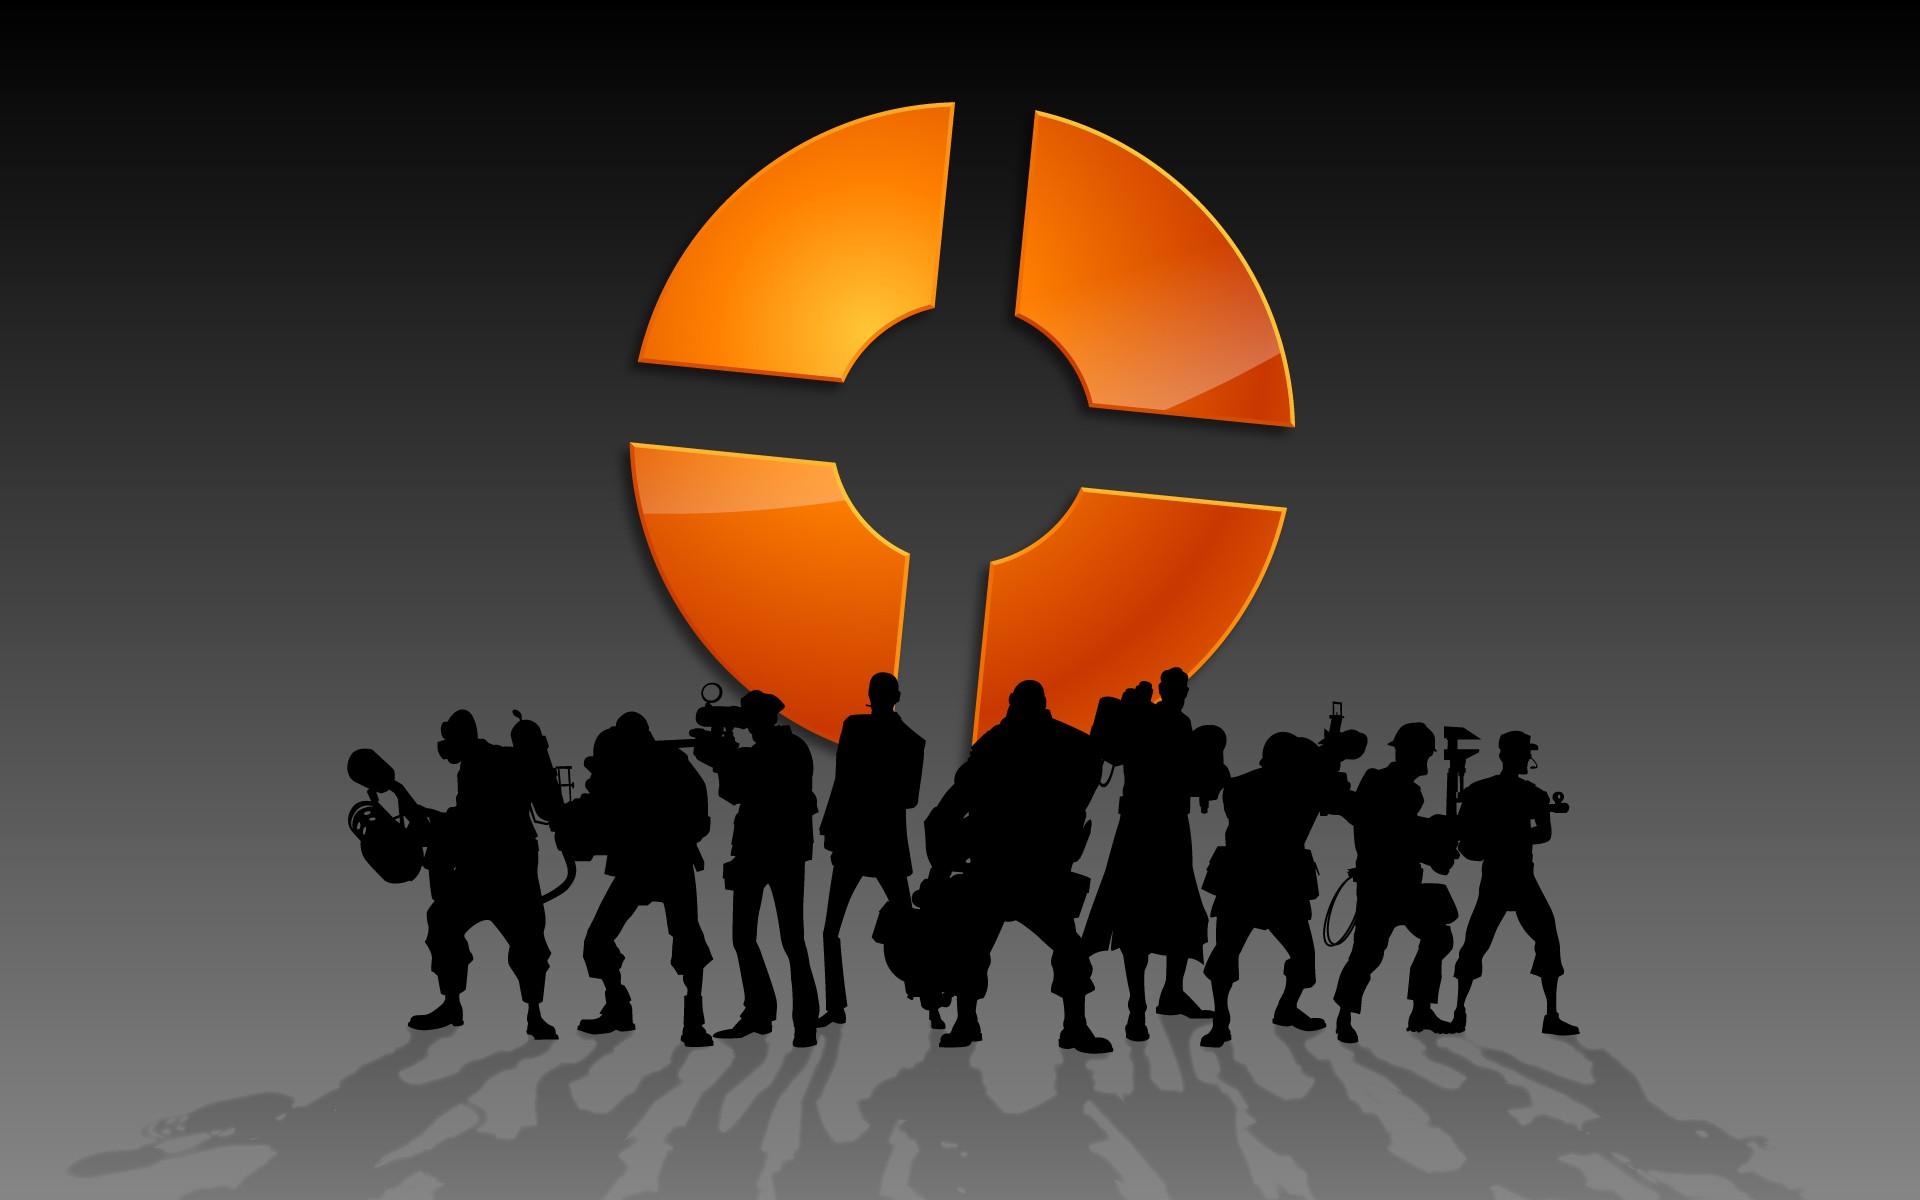 team fortress 2 download no steam mac